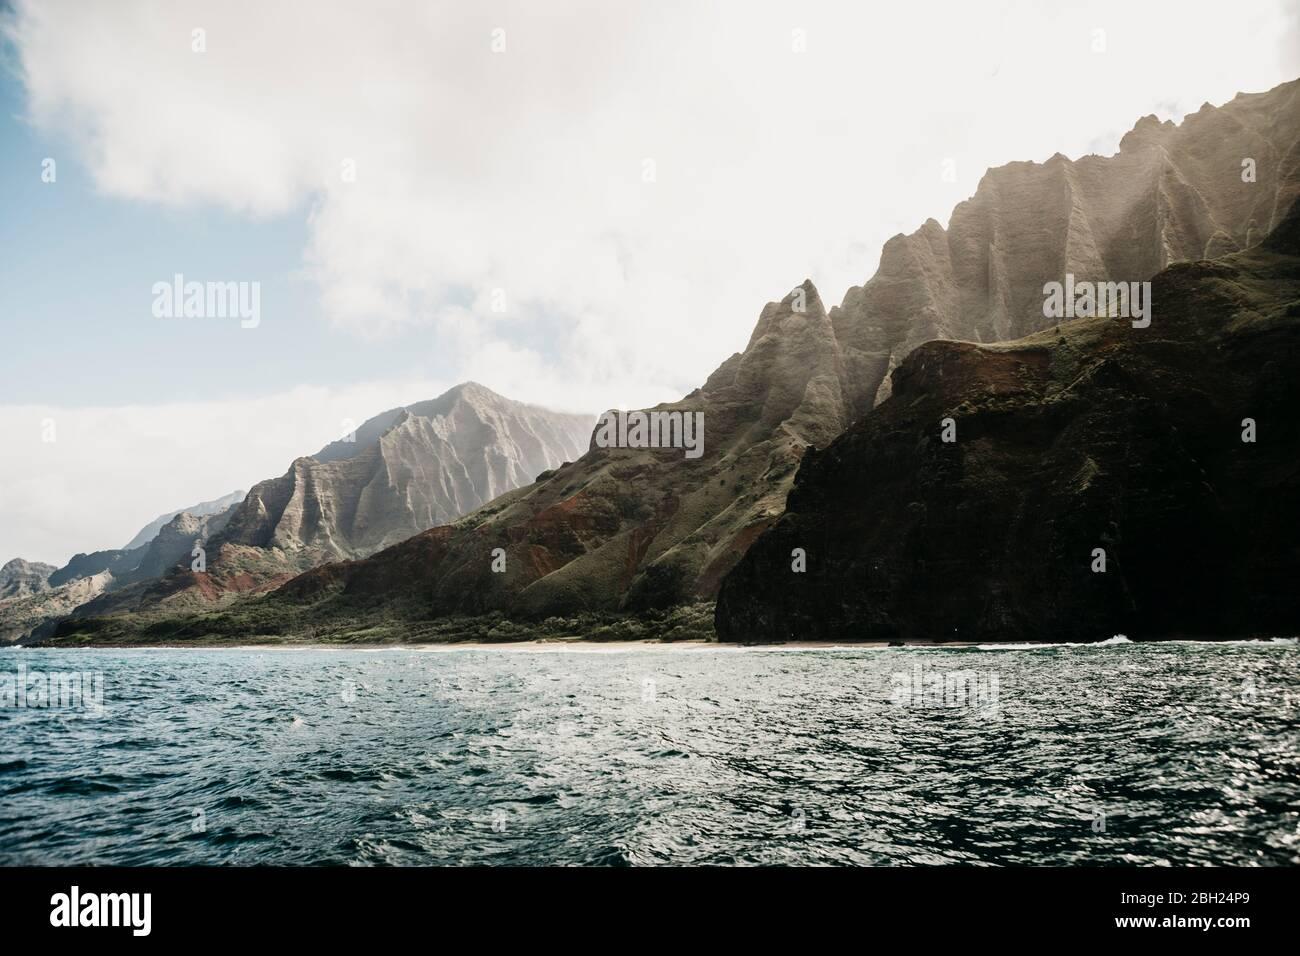 Idyllic view of mountain range and sea at Nā Pali Coast State Wilderness Park, Kauai, Hawaii, USA Stock Photo